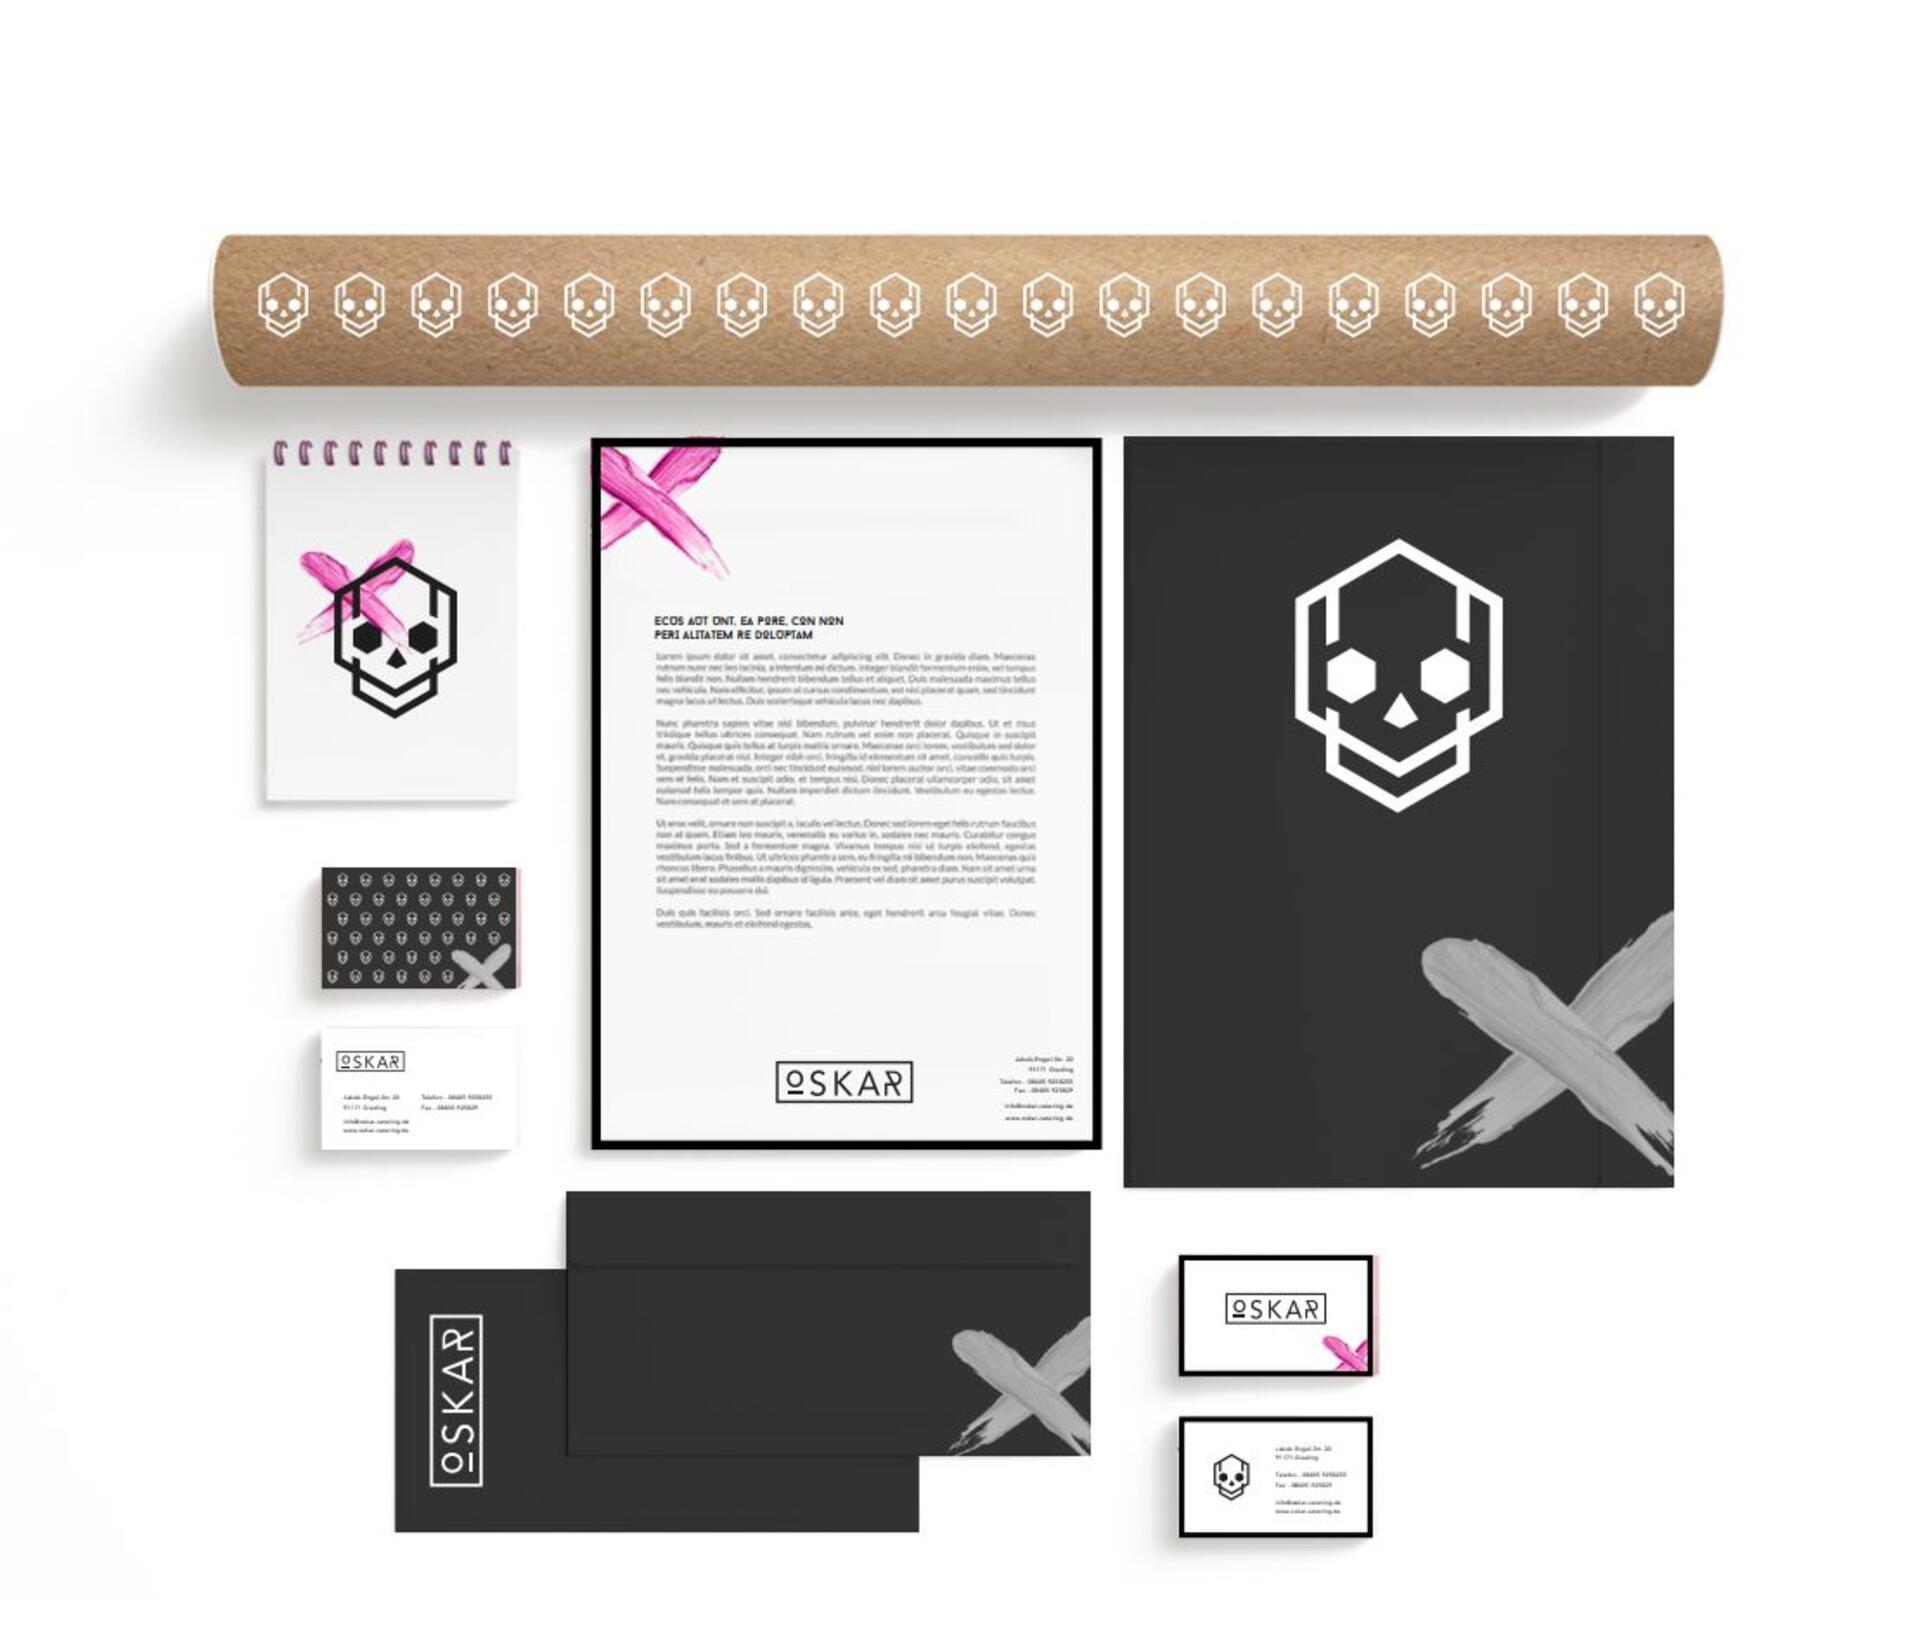 print-merchandising-oskar-catering-design-besonders-sein